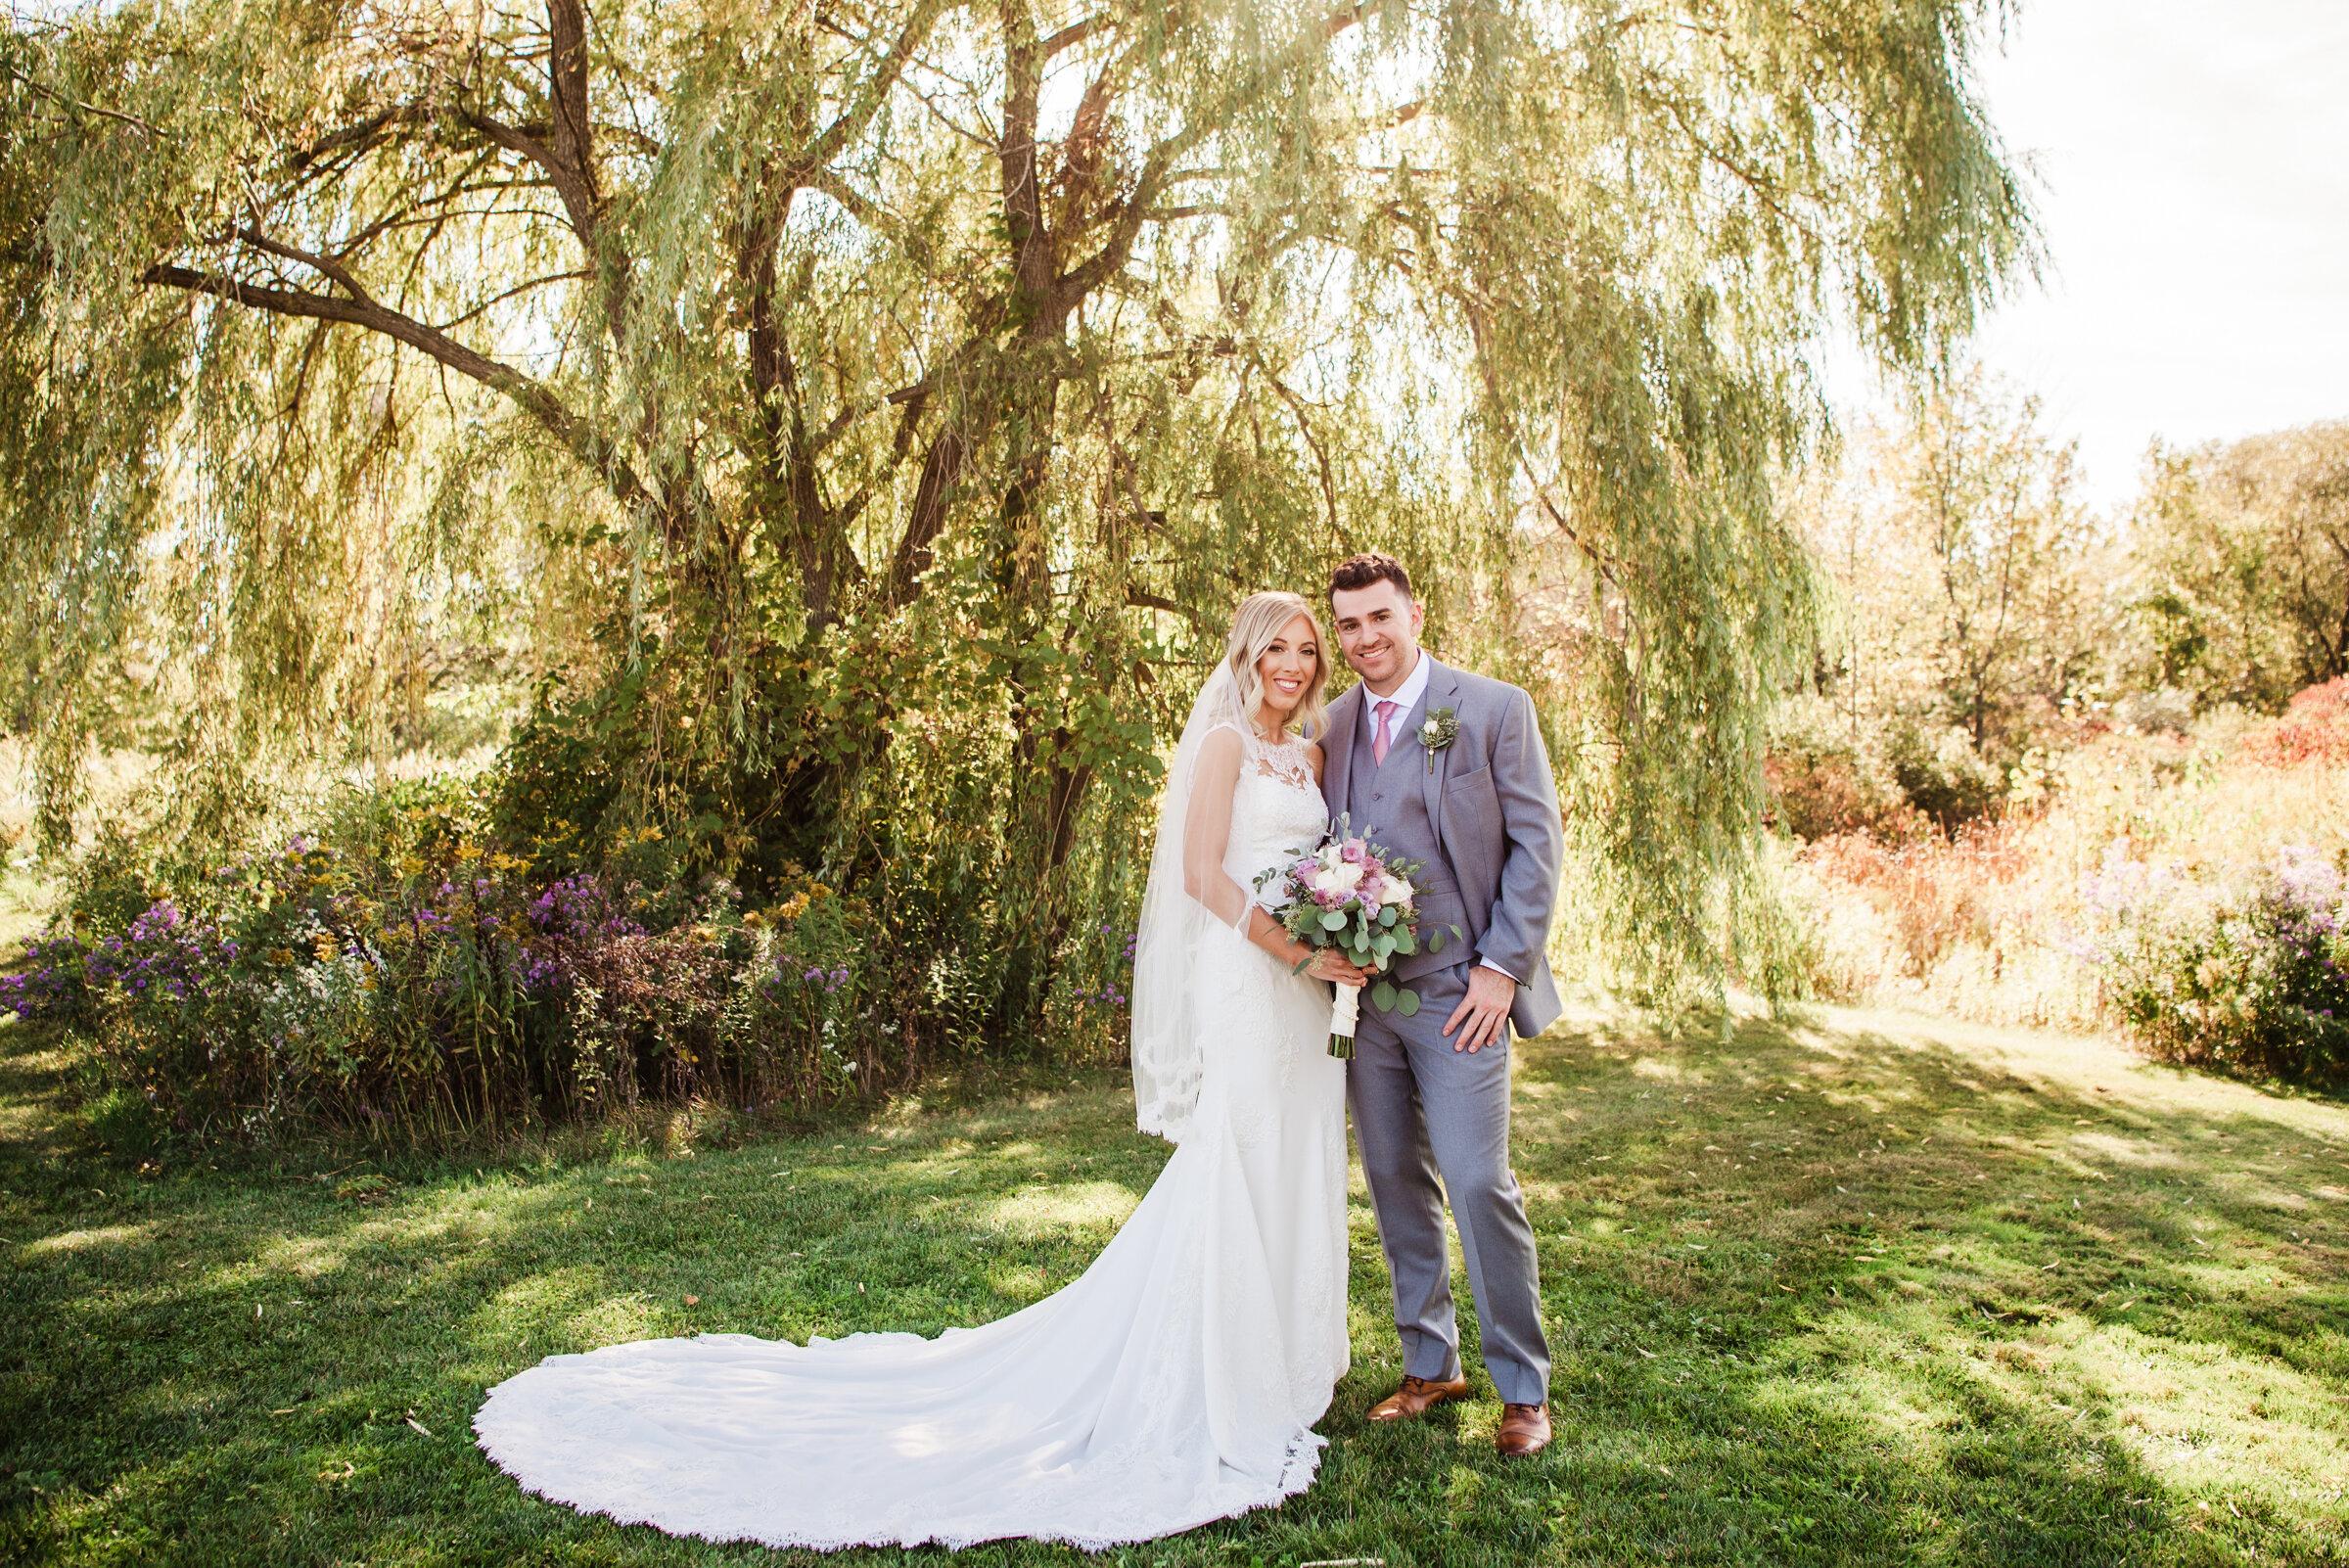 Deerfield_Country_Club_Rochester_Wedding_JILL_STUDIO_Rochester_NY_Photographer_DSC_6360.jpg